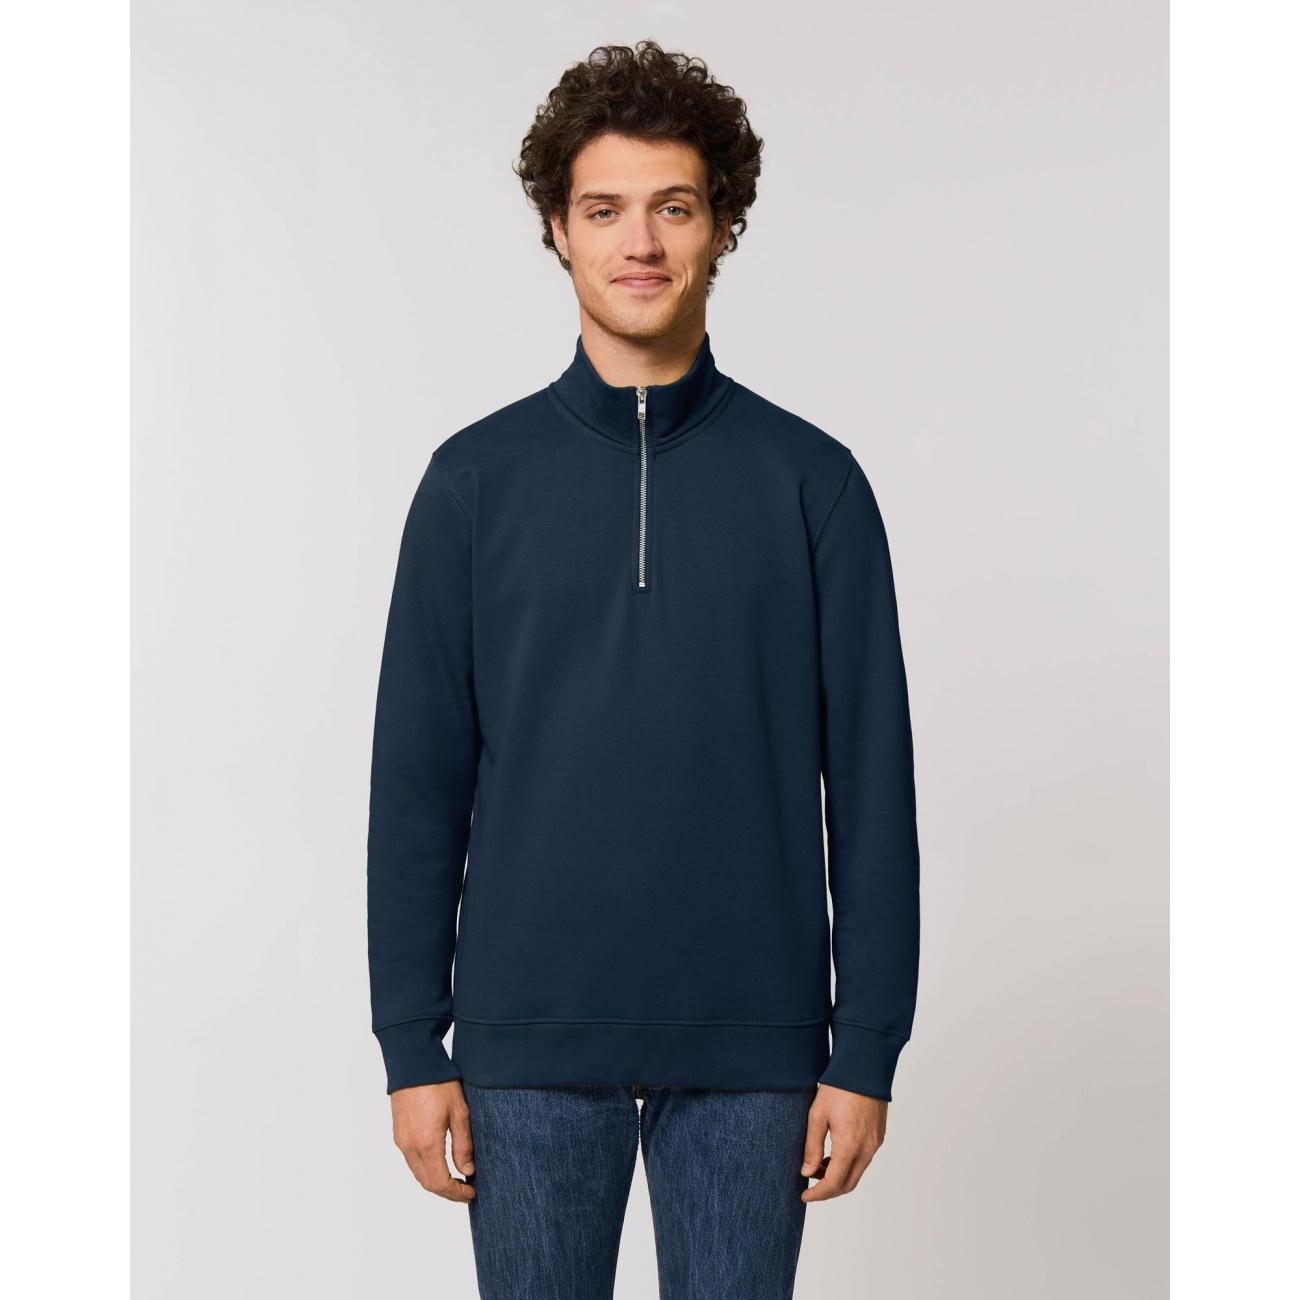 https://tee-shirt-bio.com/8534-thickbox_default/sweat-shirt-col-zippee-montant-homme-bleu-marine-coton-bio-.jpg